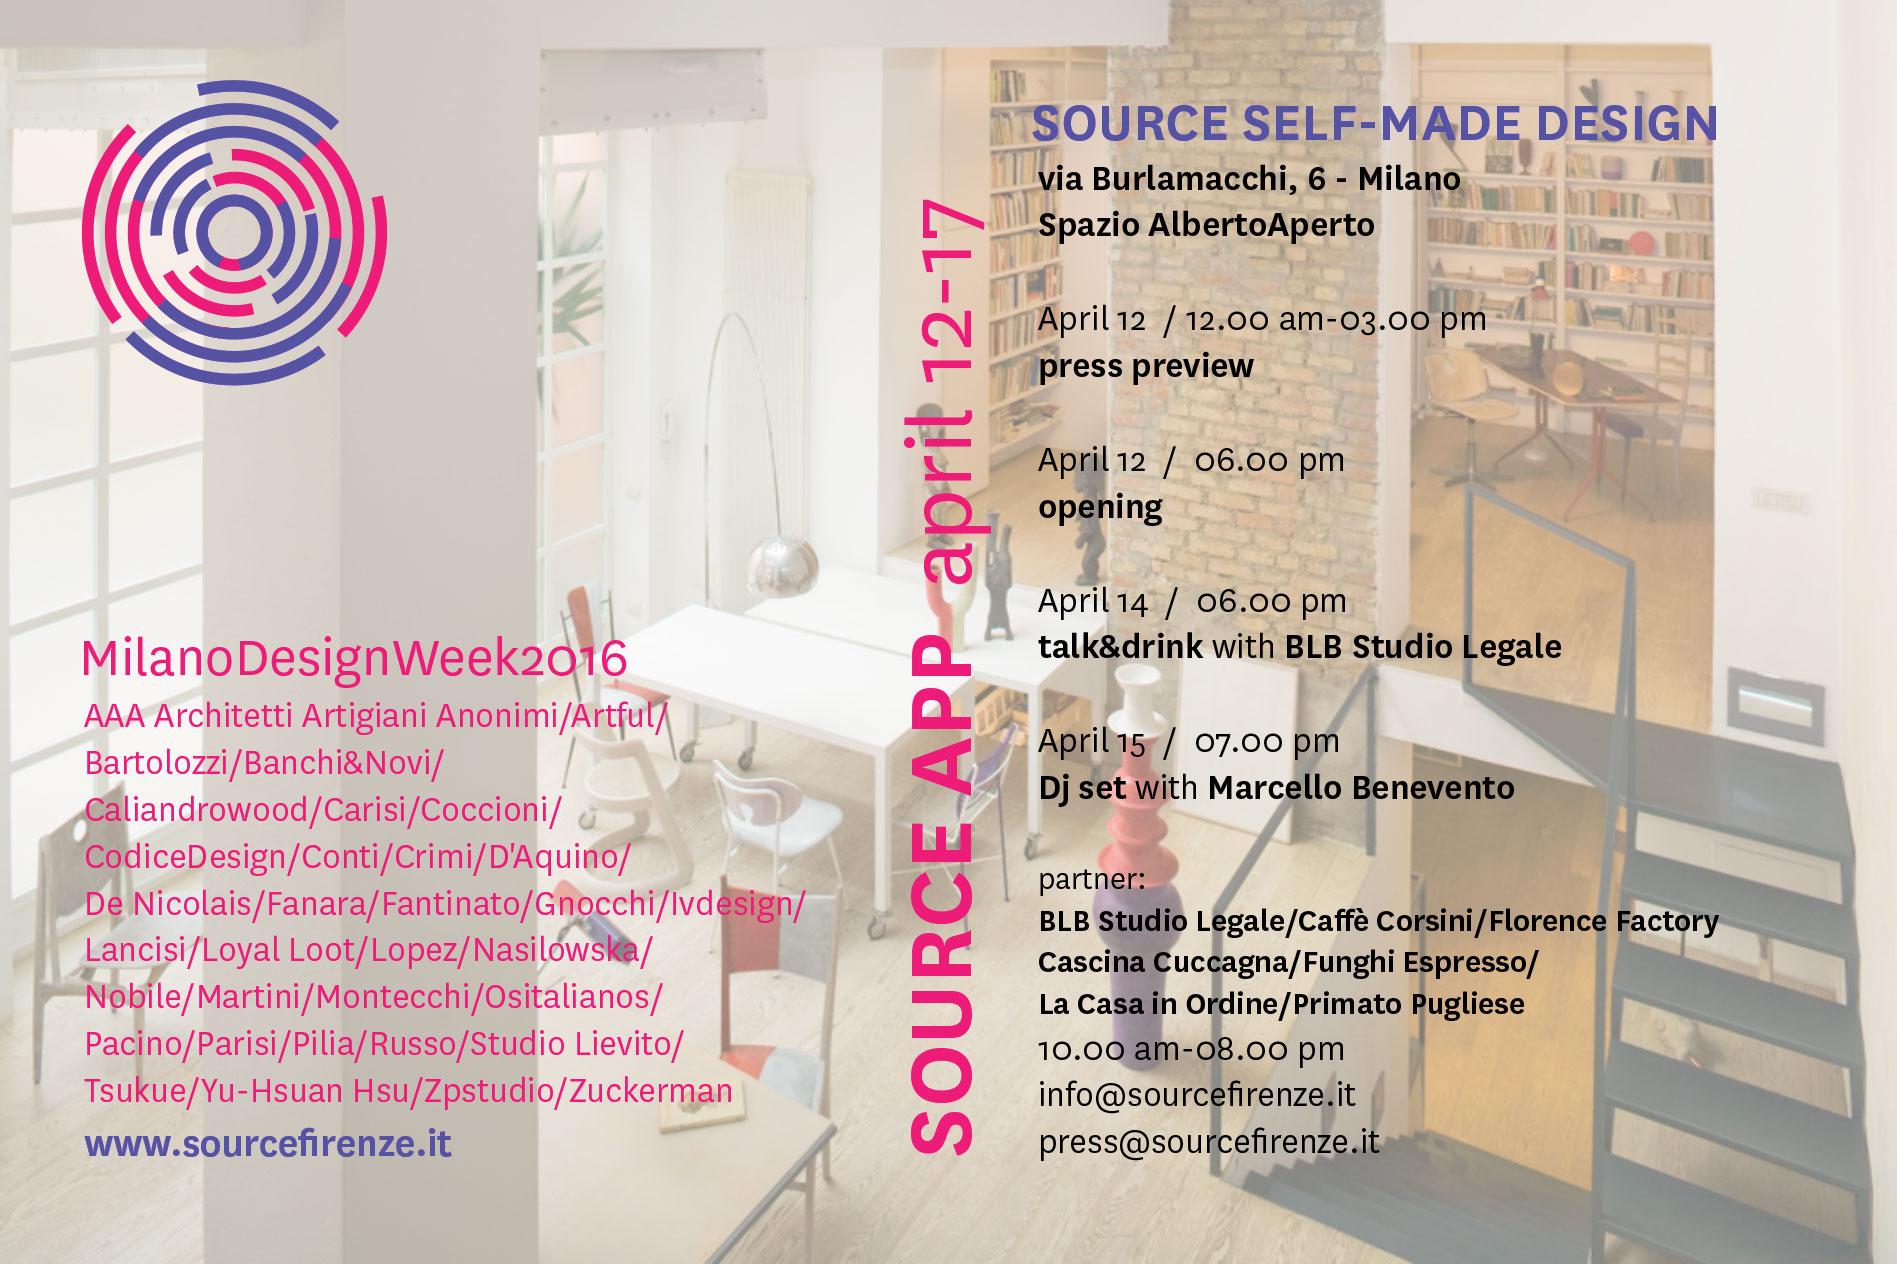 Source Self Made Design Source App